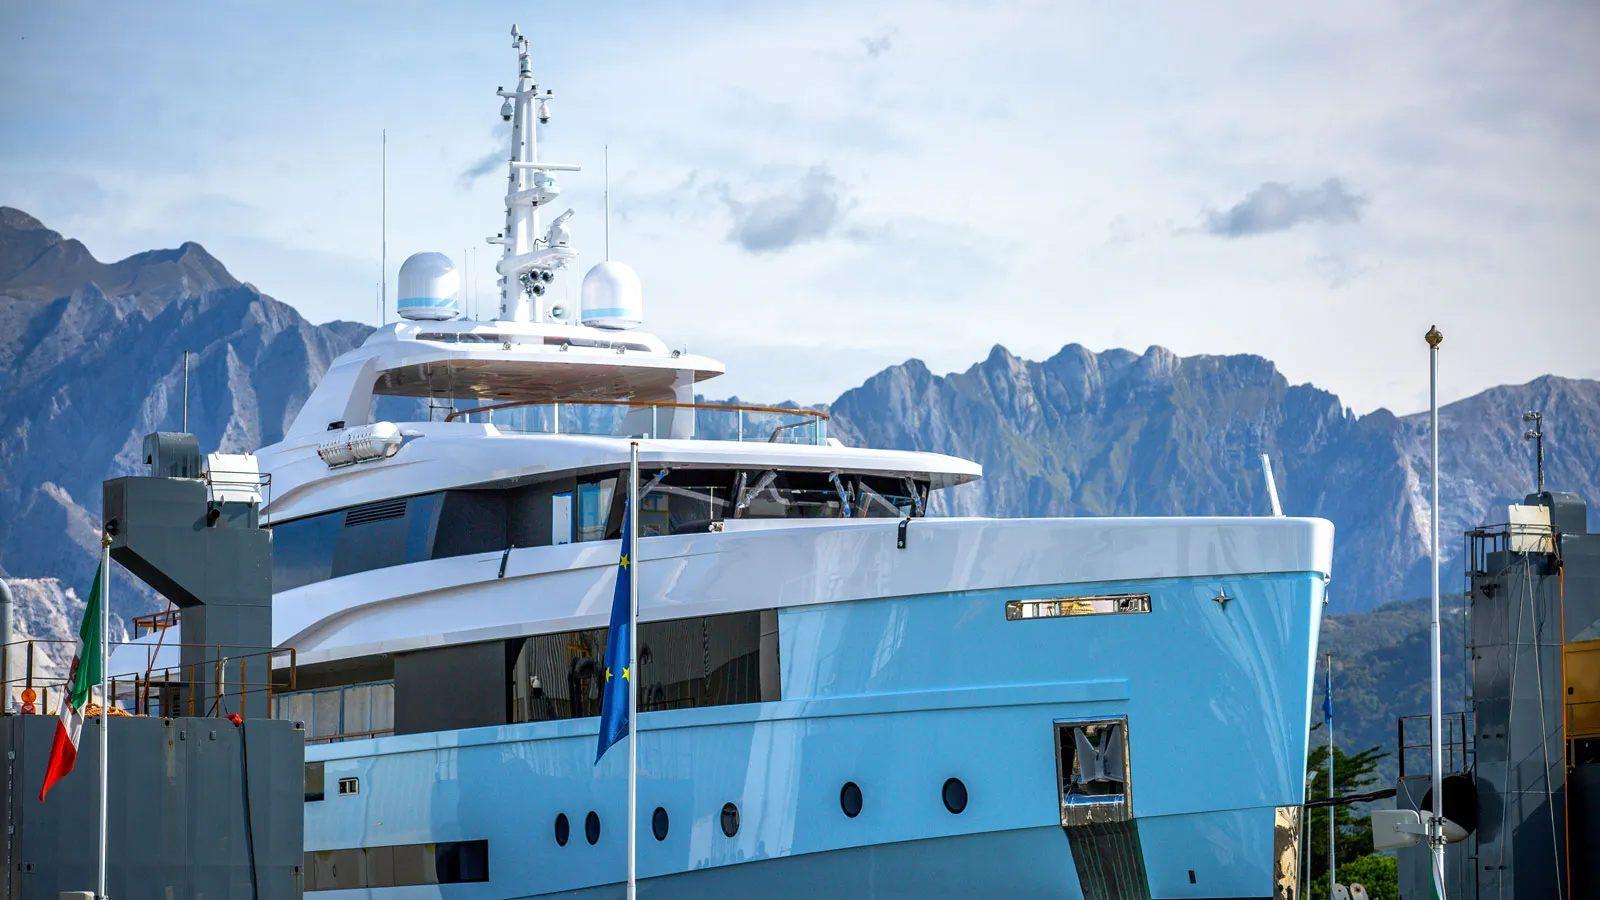 ADMIRAL YACHT CROCUS Superiate - boat shopping